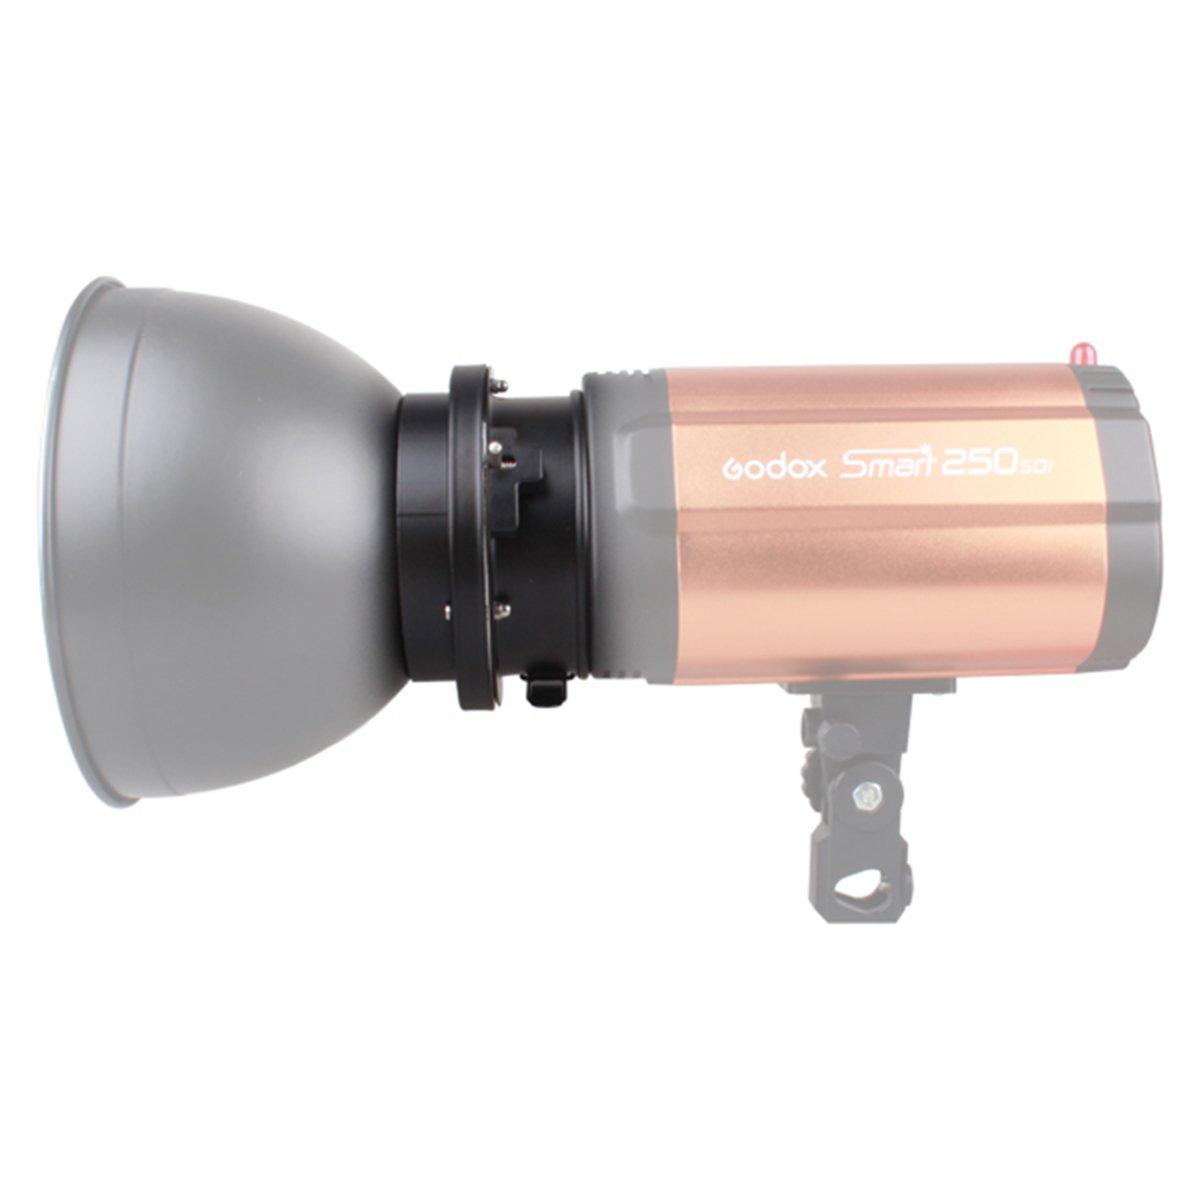 Godox 98mm Universal Mount To Bowens Mounts Speedring Adapter Studio Flash Strobe for Godox K150A K180A 250DI 300DI 250SDI by Godox (Image #3)